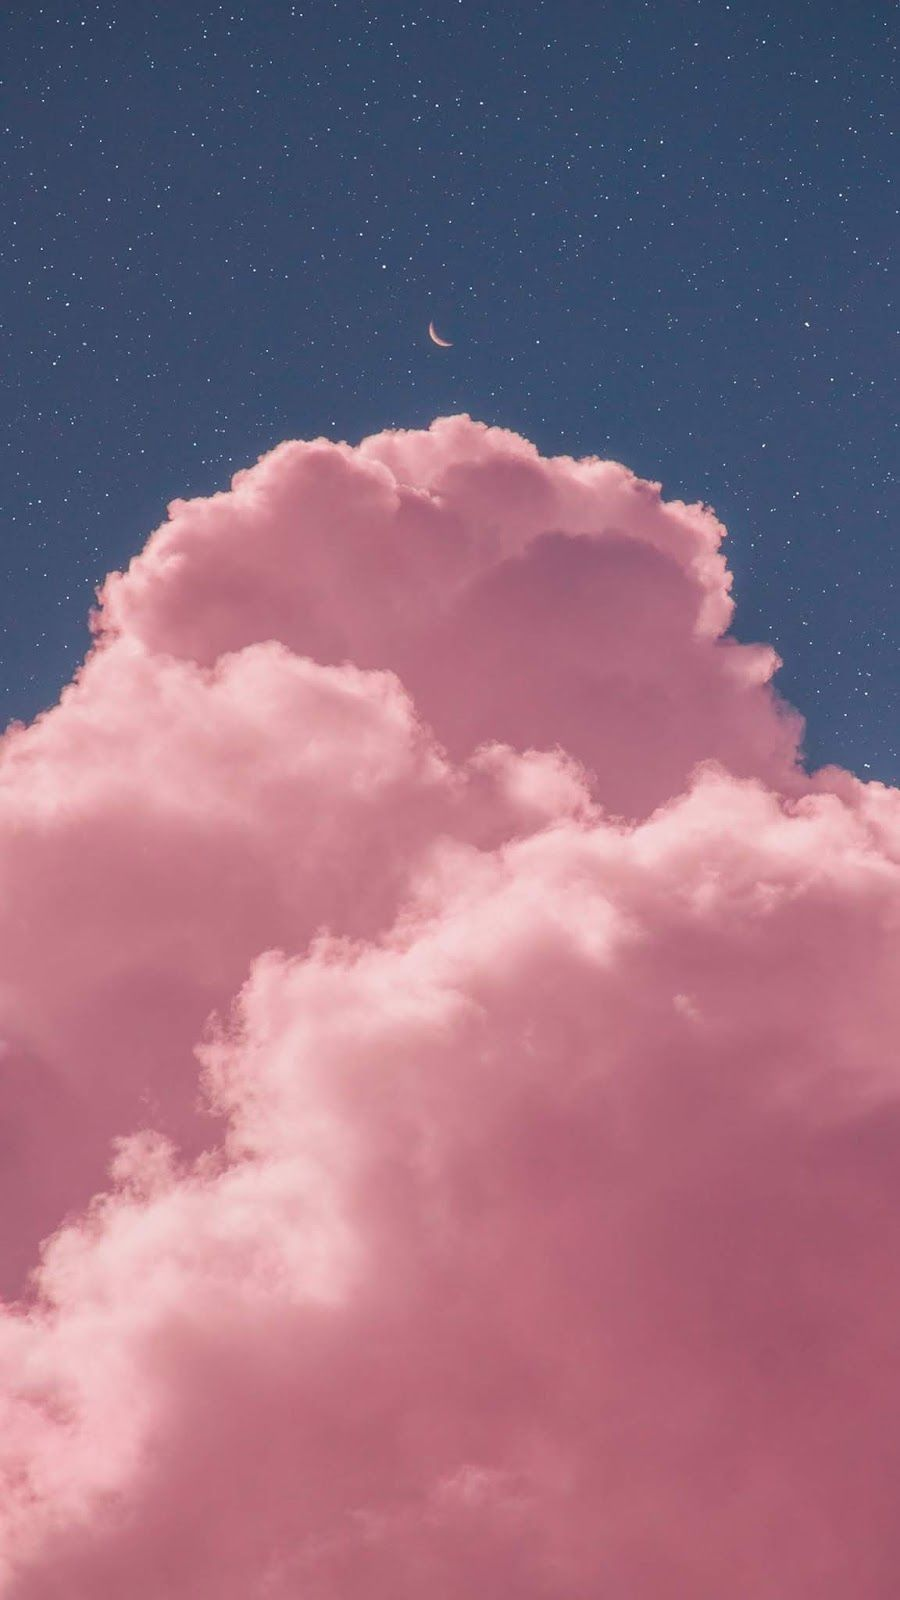 C Est Celeste Pink Clouds Wallpaper Aesthetic Iphone Wallpaper Galaxy Wallpaper